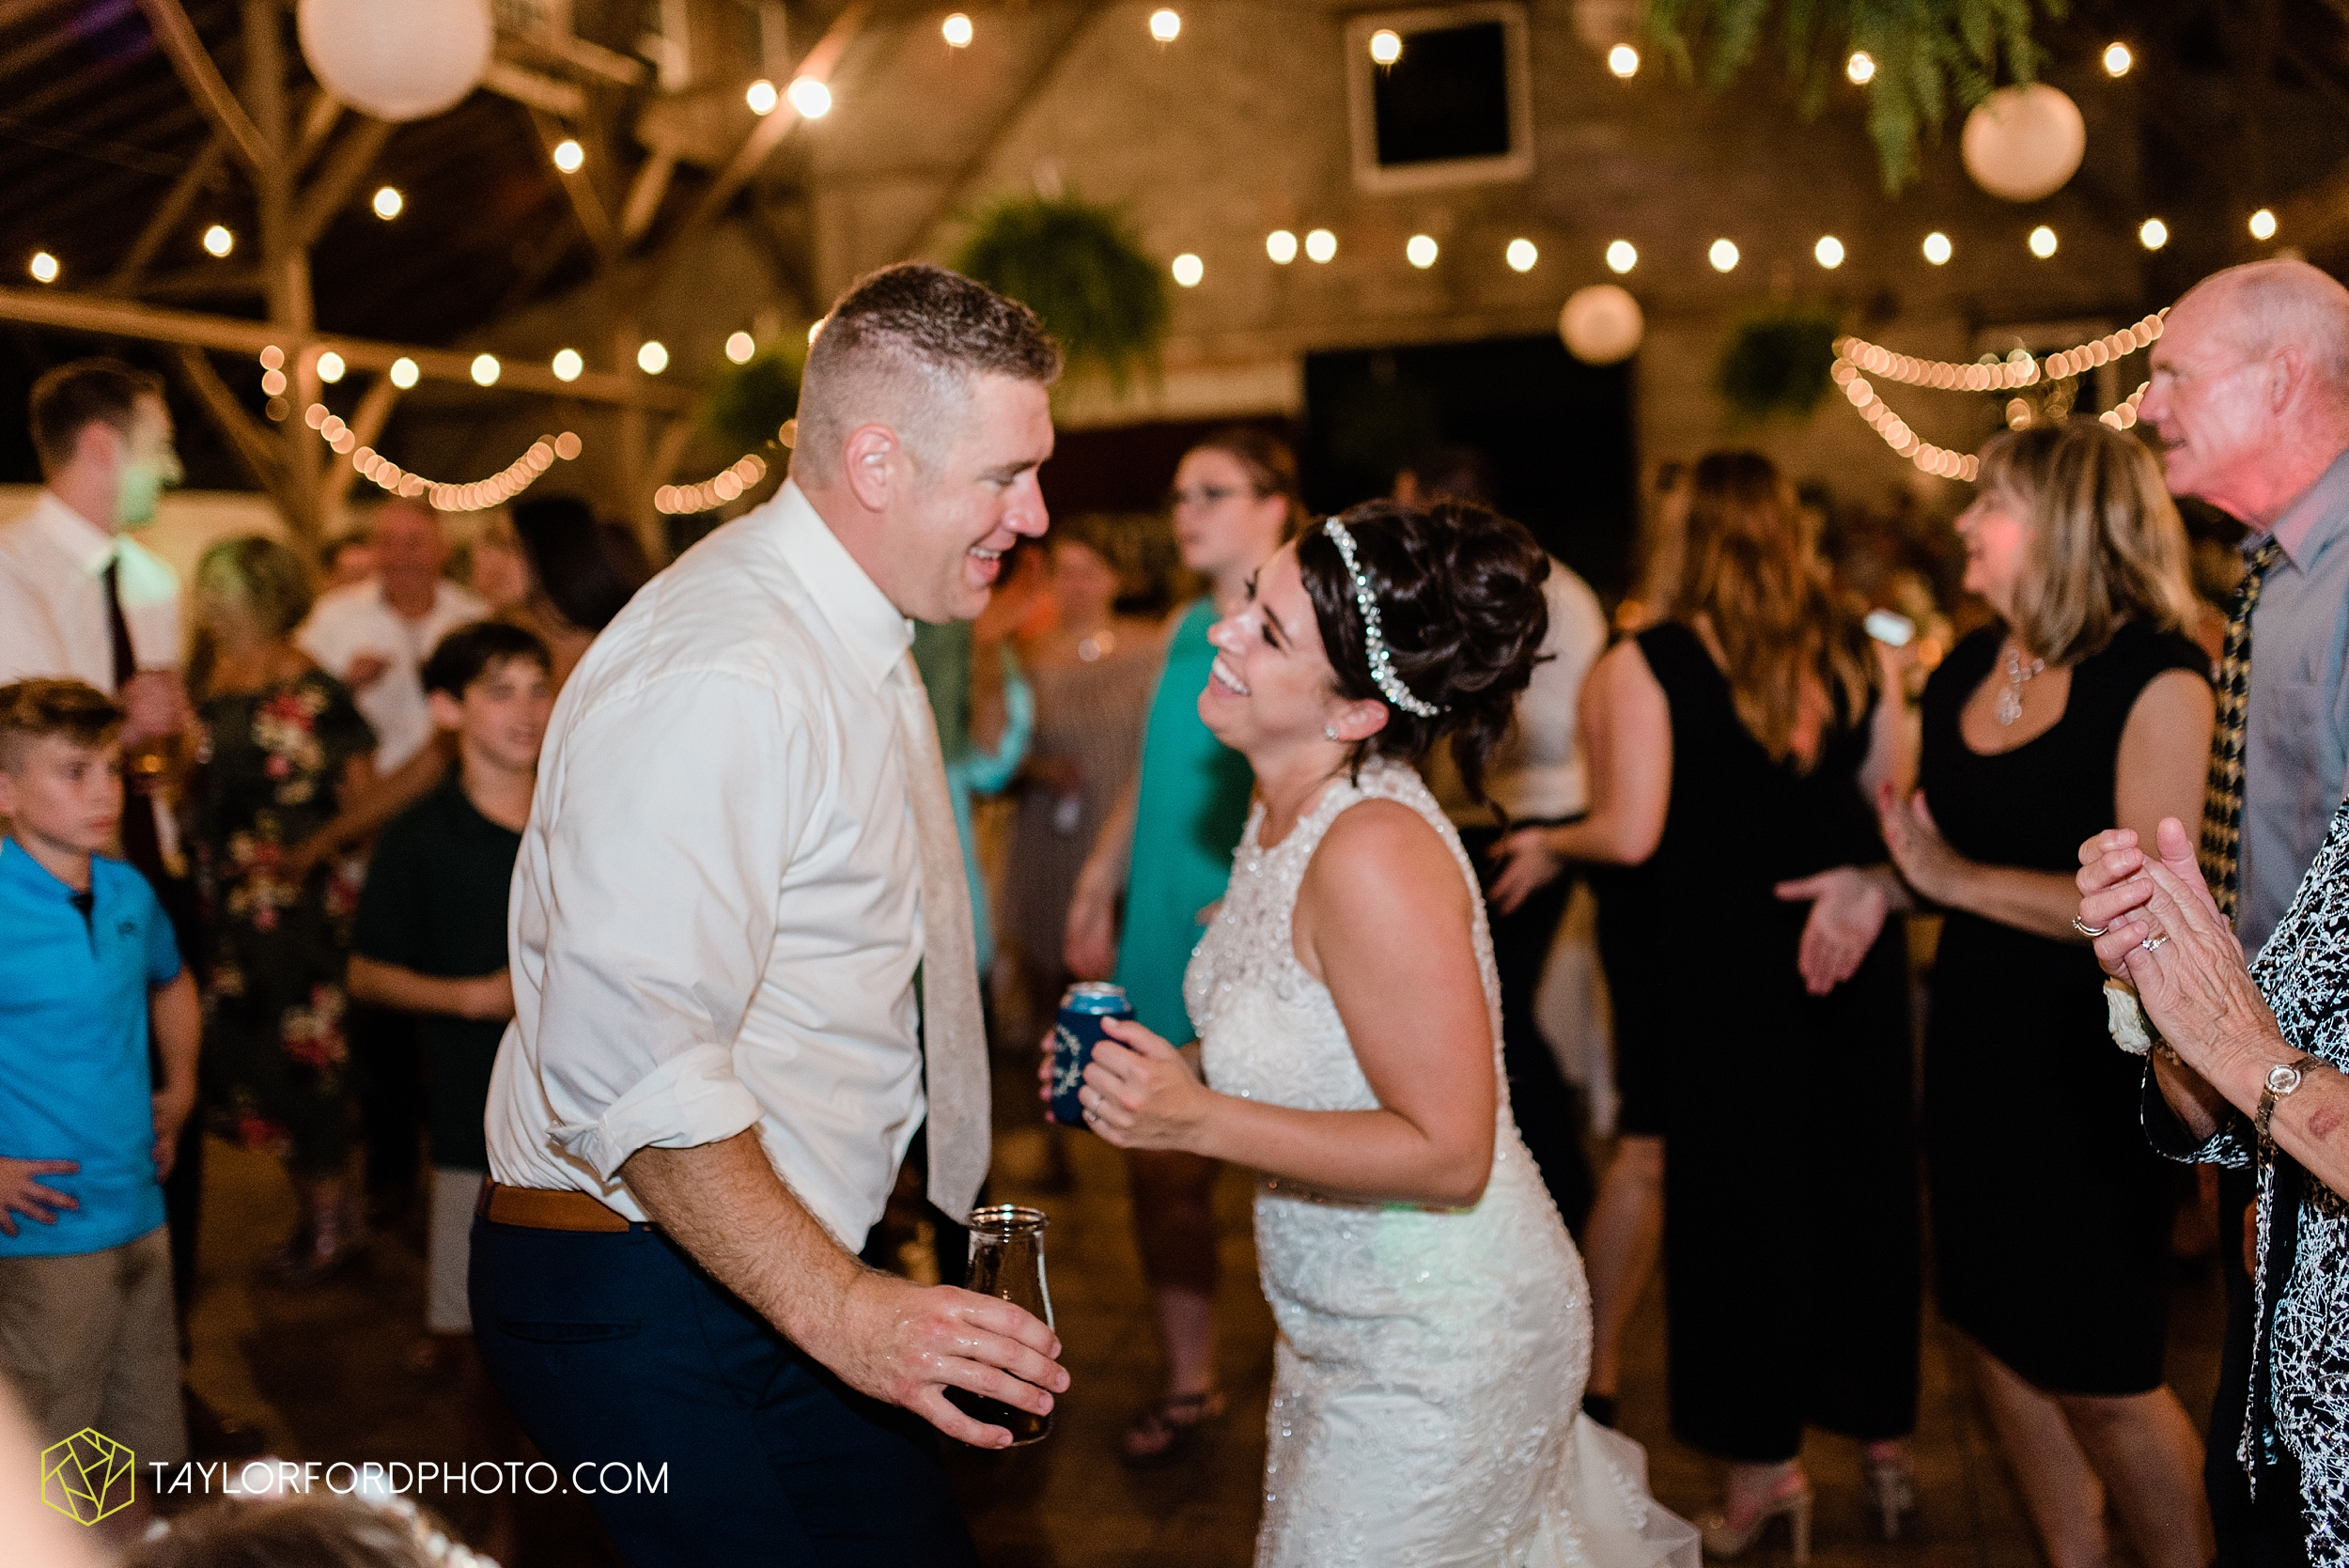 van-wert-ohio-first-united-methodist-church-county-dairy-barn-wedding-photographer-taylor-ford-photography_9889.jpg